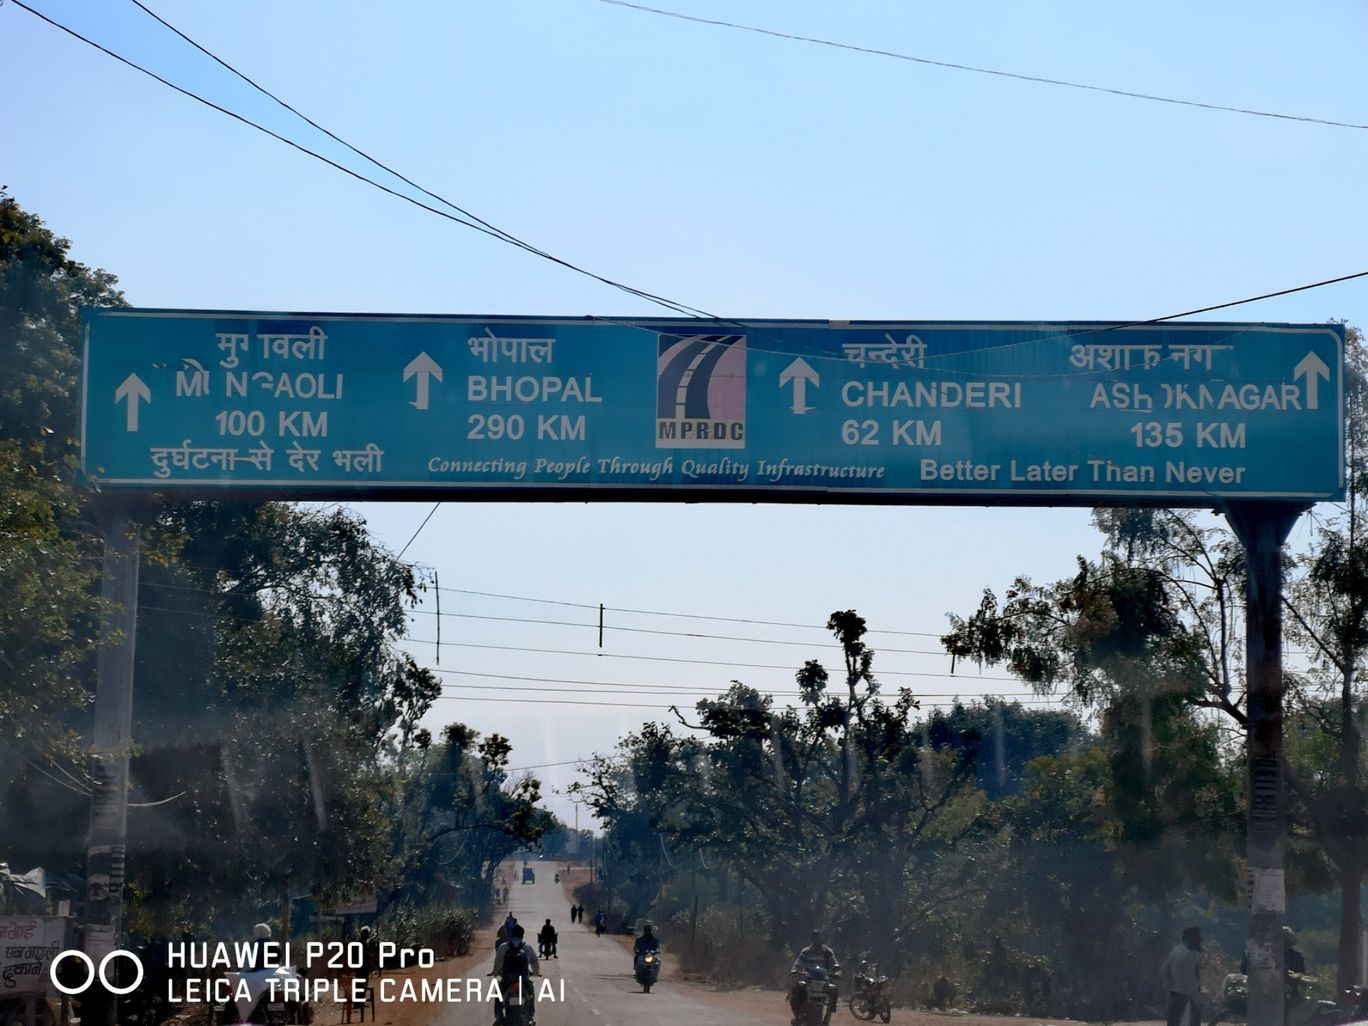 Photo of choubeyanapura By Manish Kumar